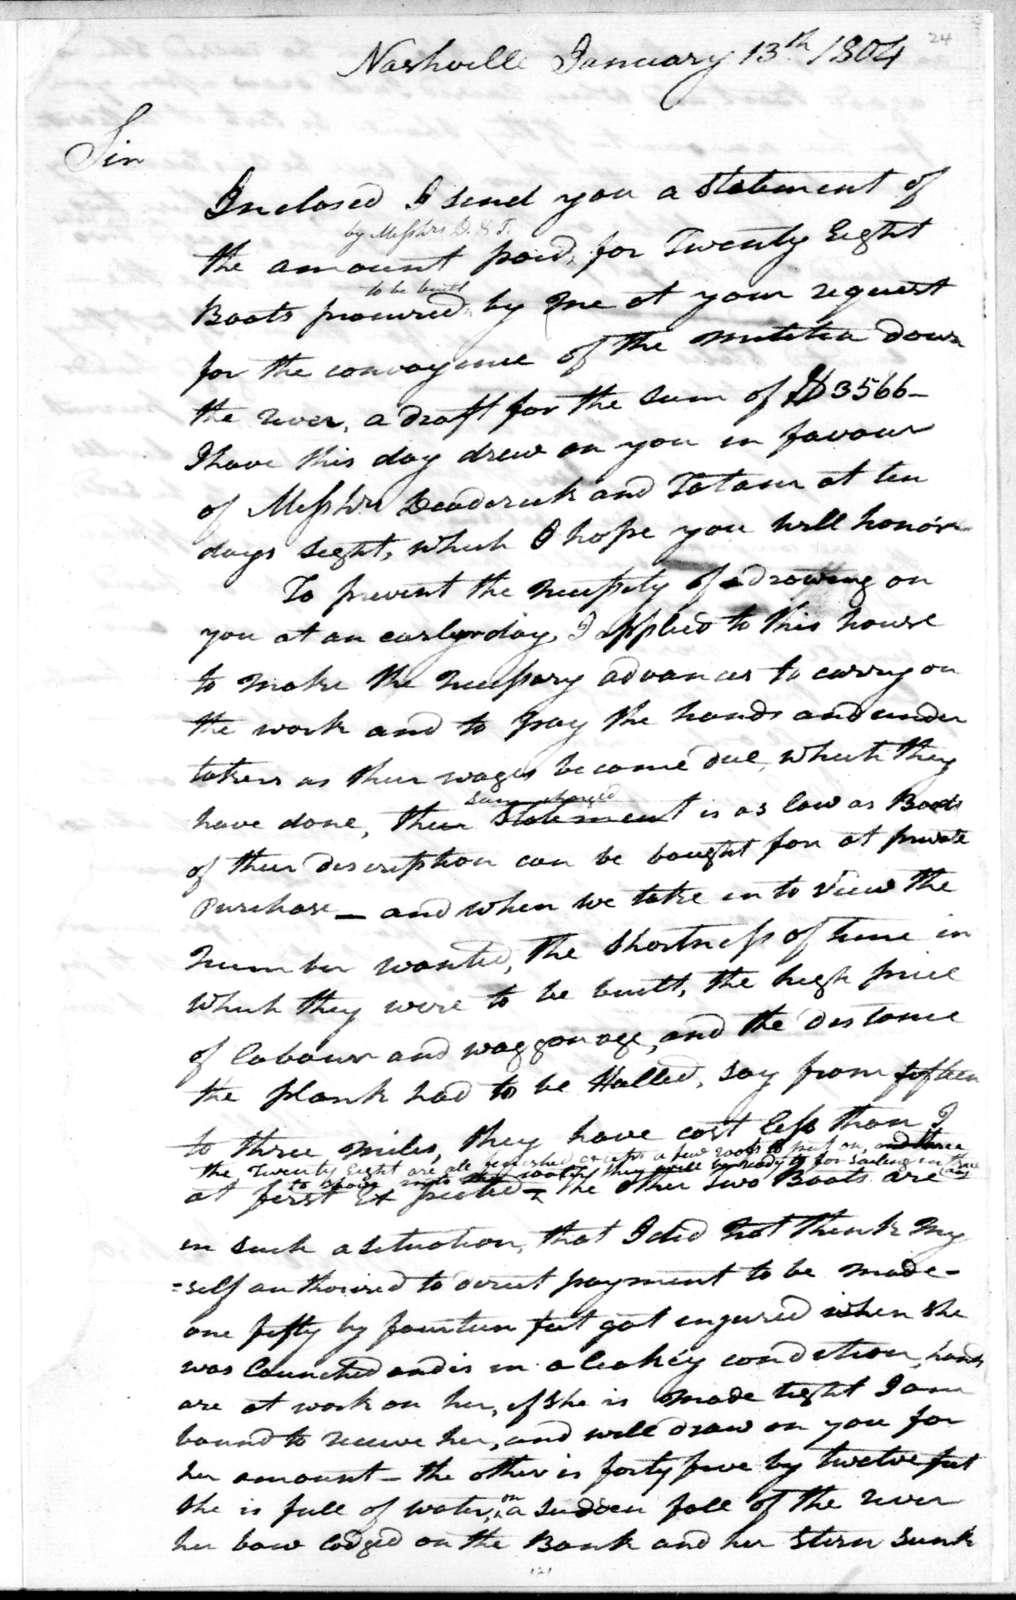 Andrew Jackson to Henry Dearborn, January 13, 1804